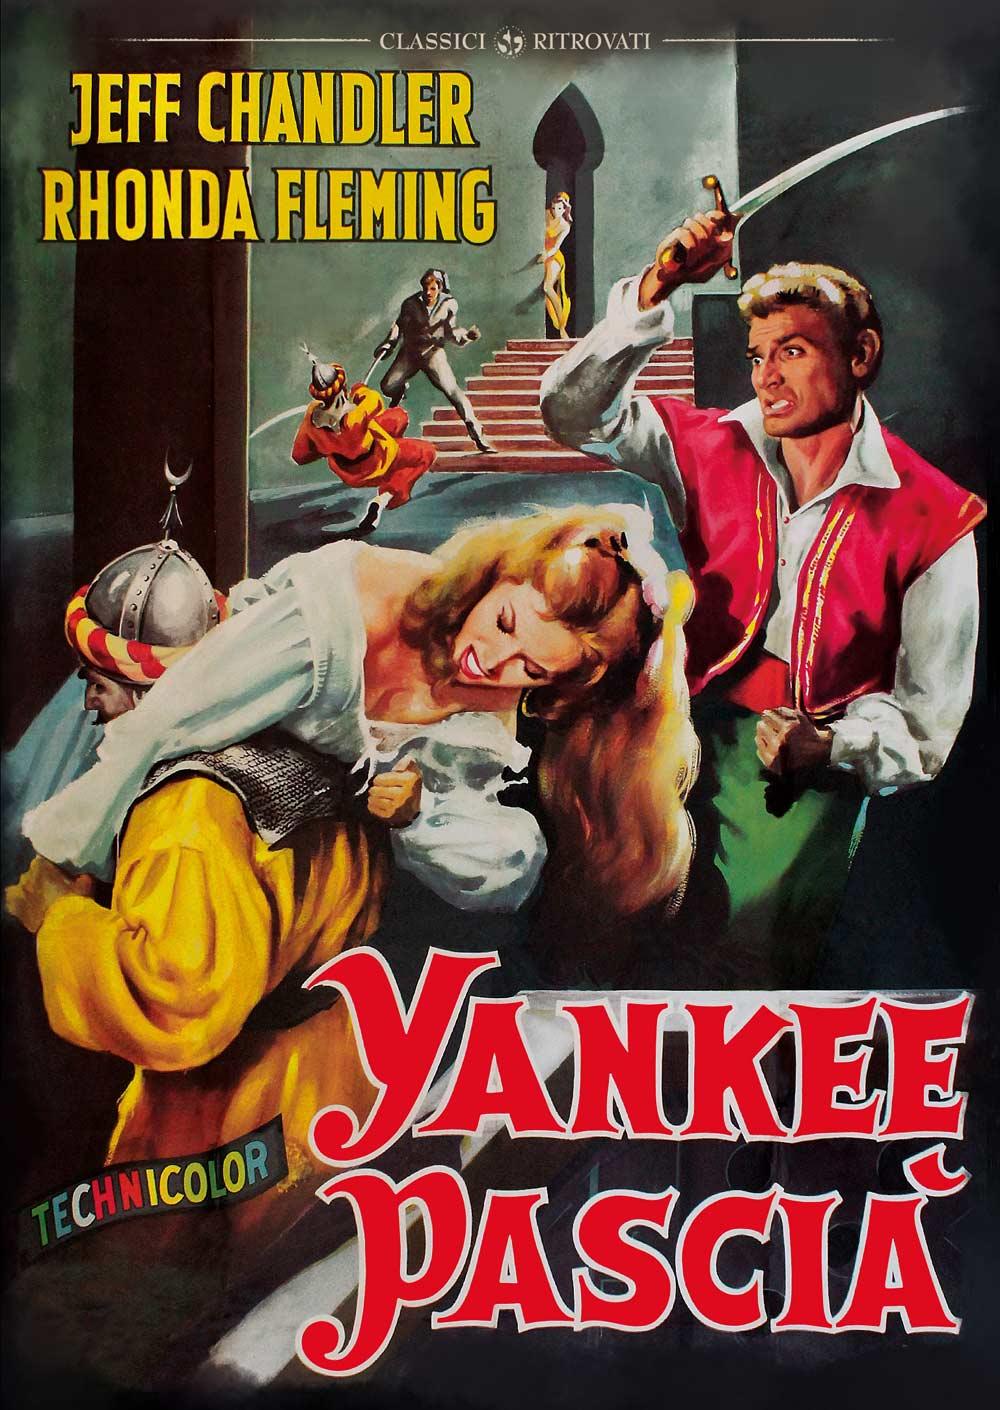 YANKEE PASCIA' (DVD)